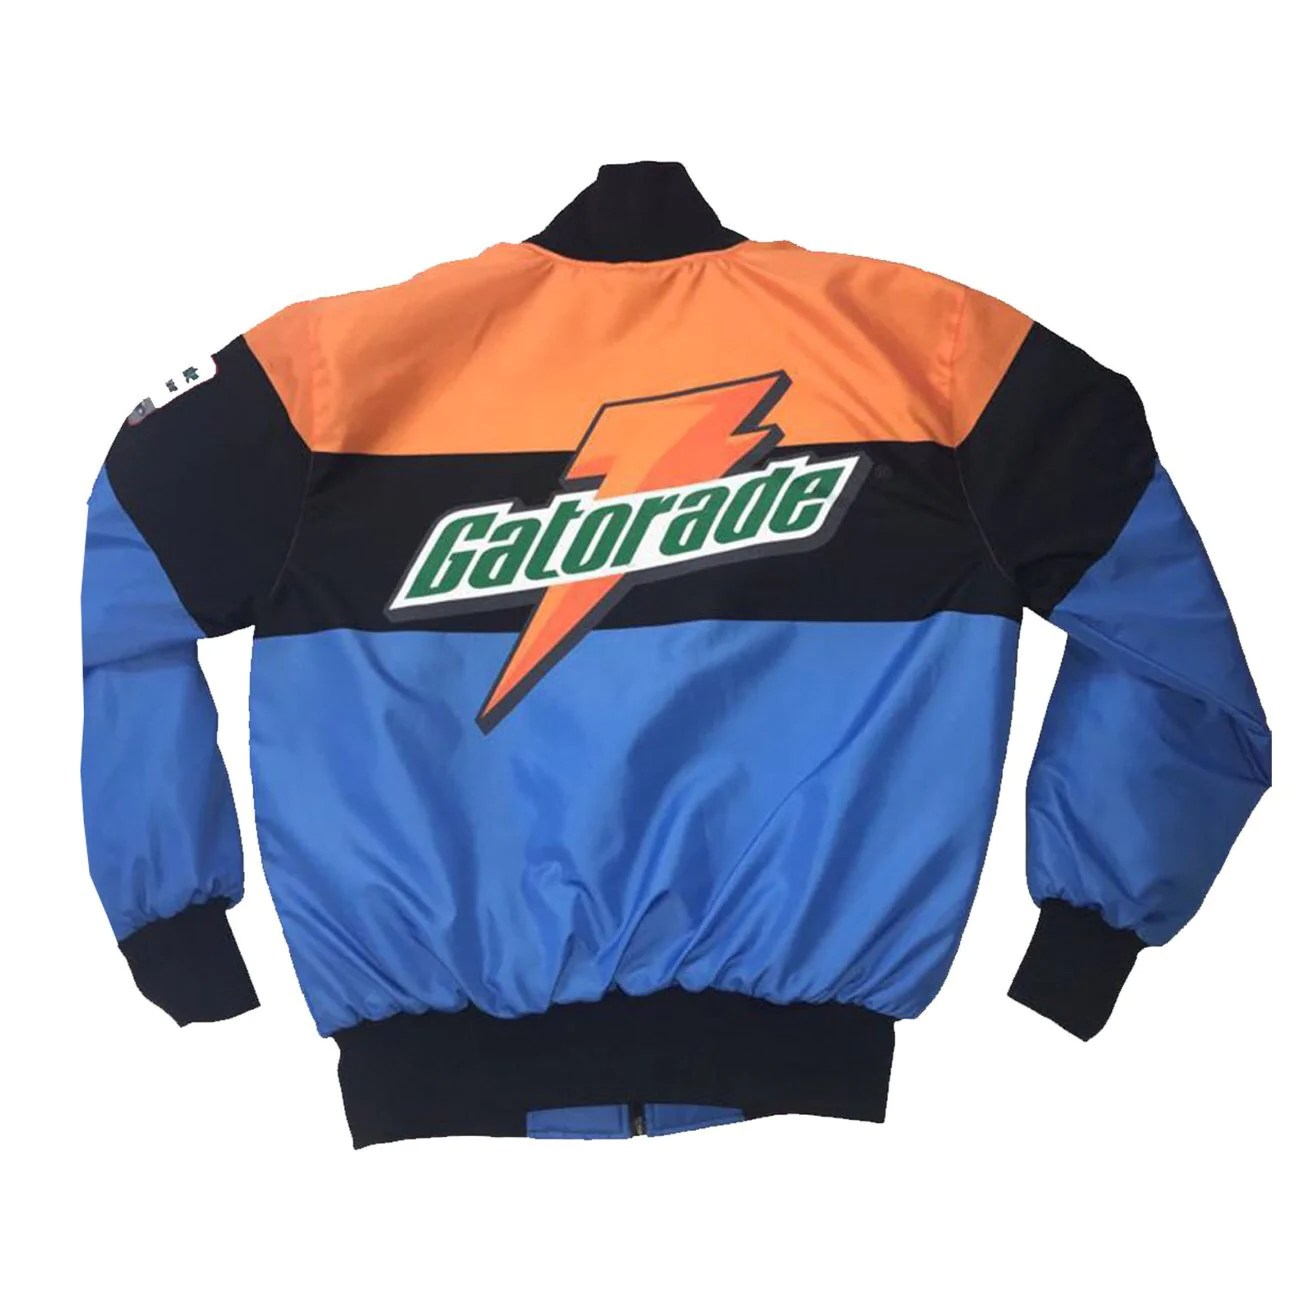 Nostalgic Club Gatorade Jacket In Blue